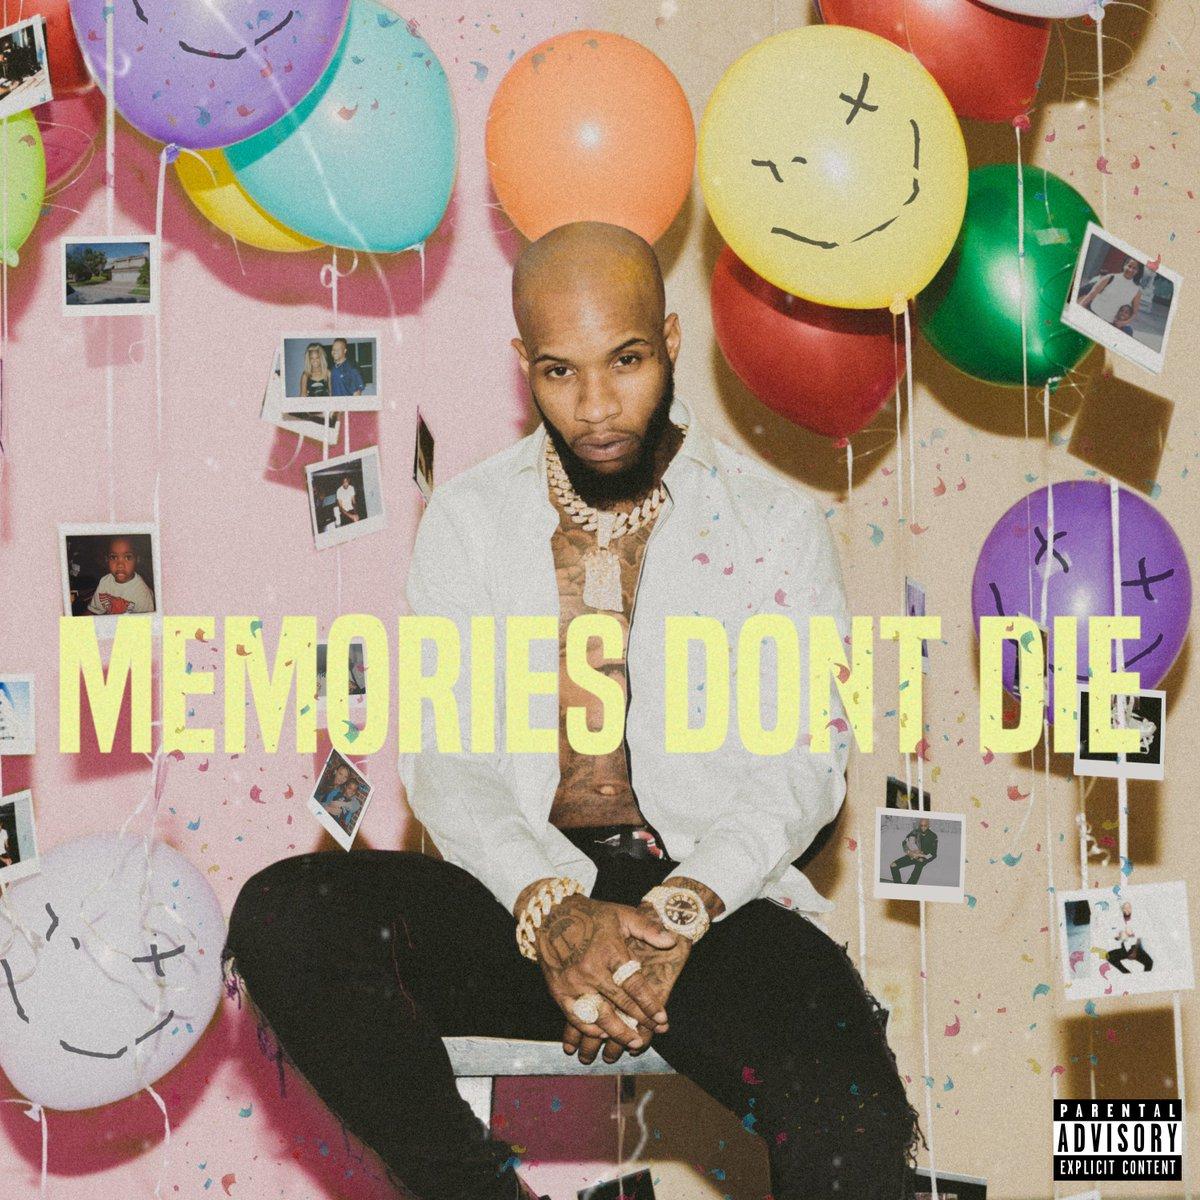 MEMORIES DONT DIE 🎈 OUT NOW . smarturl.it/MemoriesDontDie